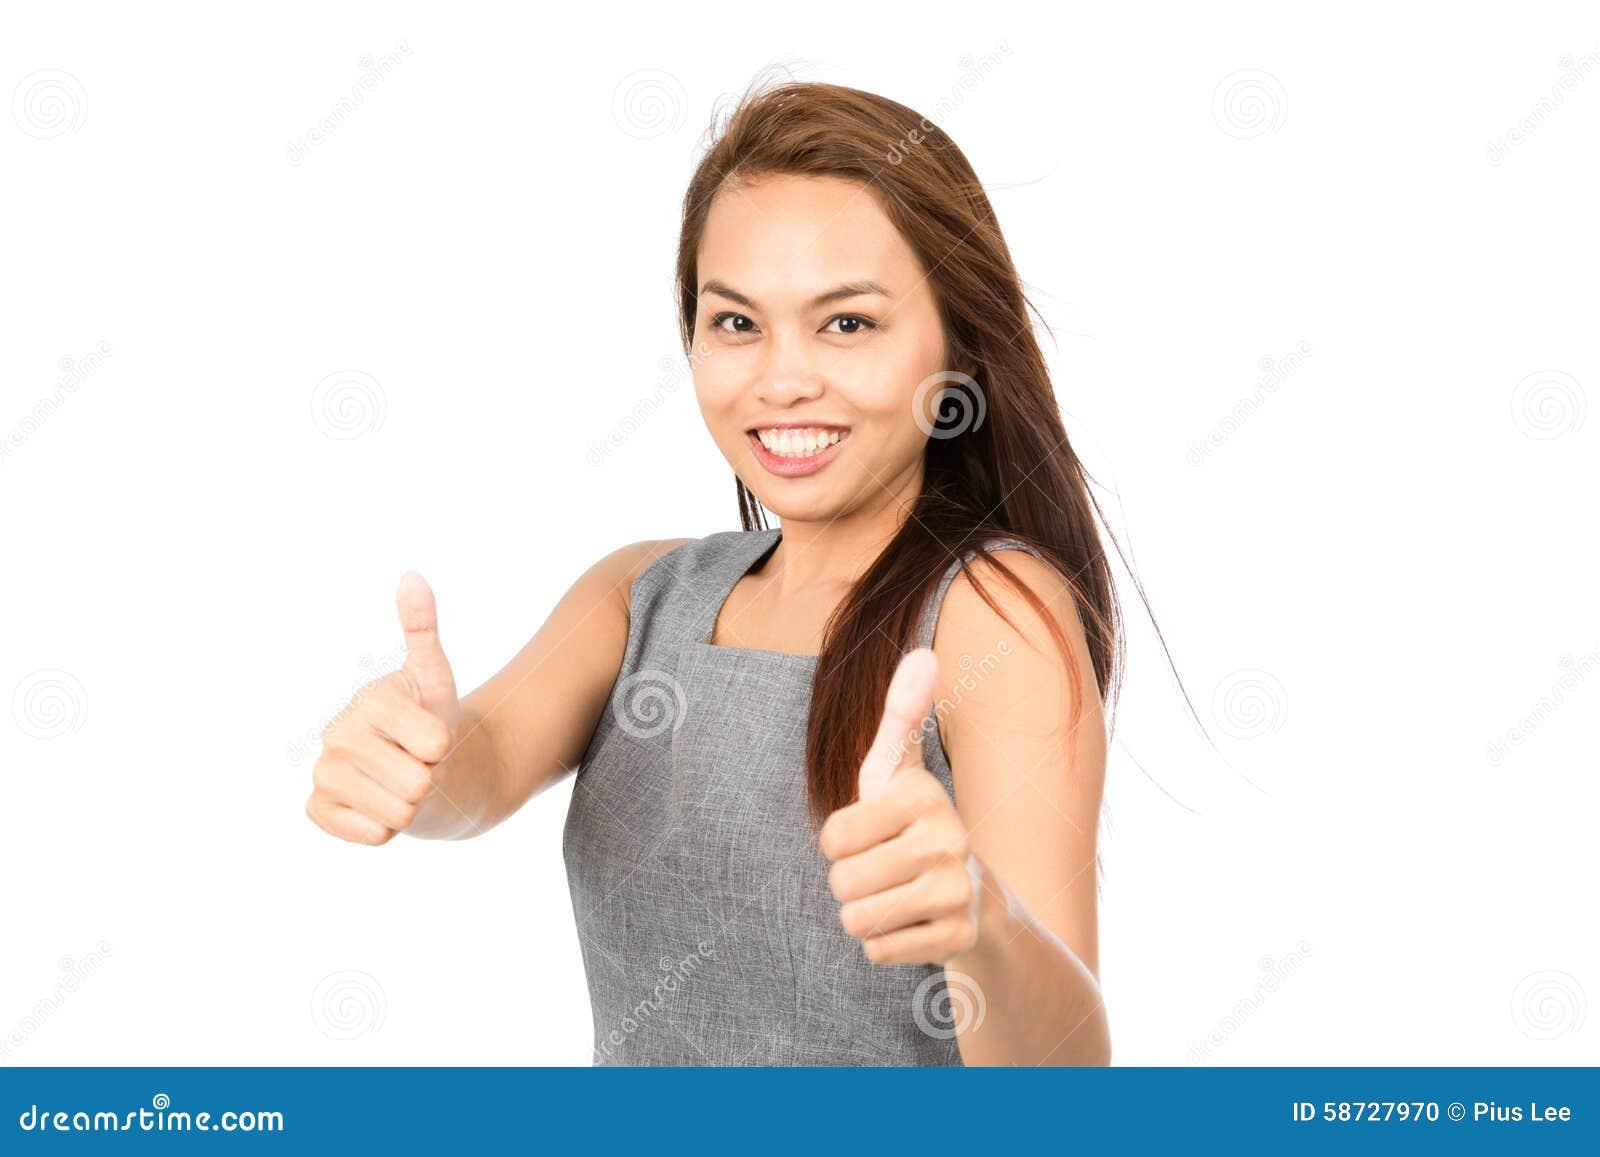 asian fetish thumbs